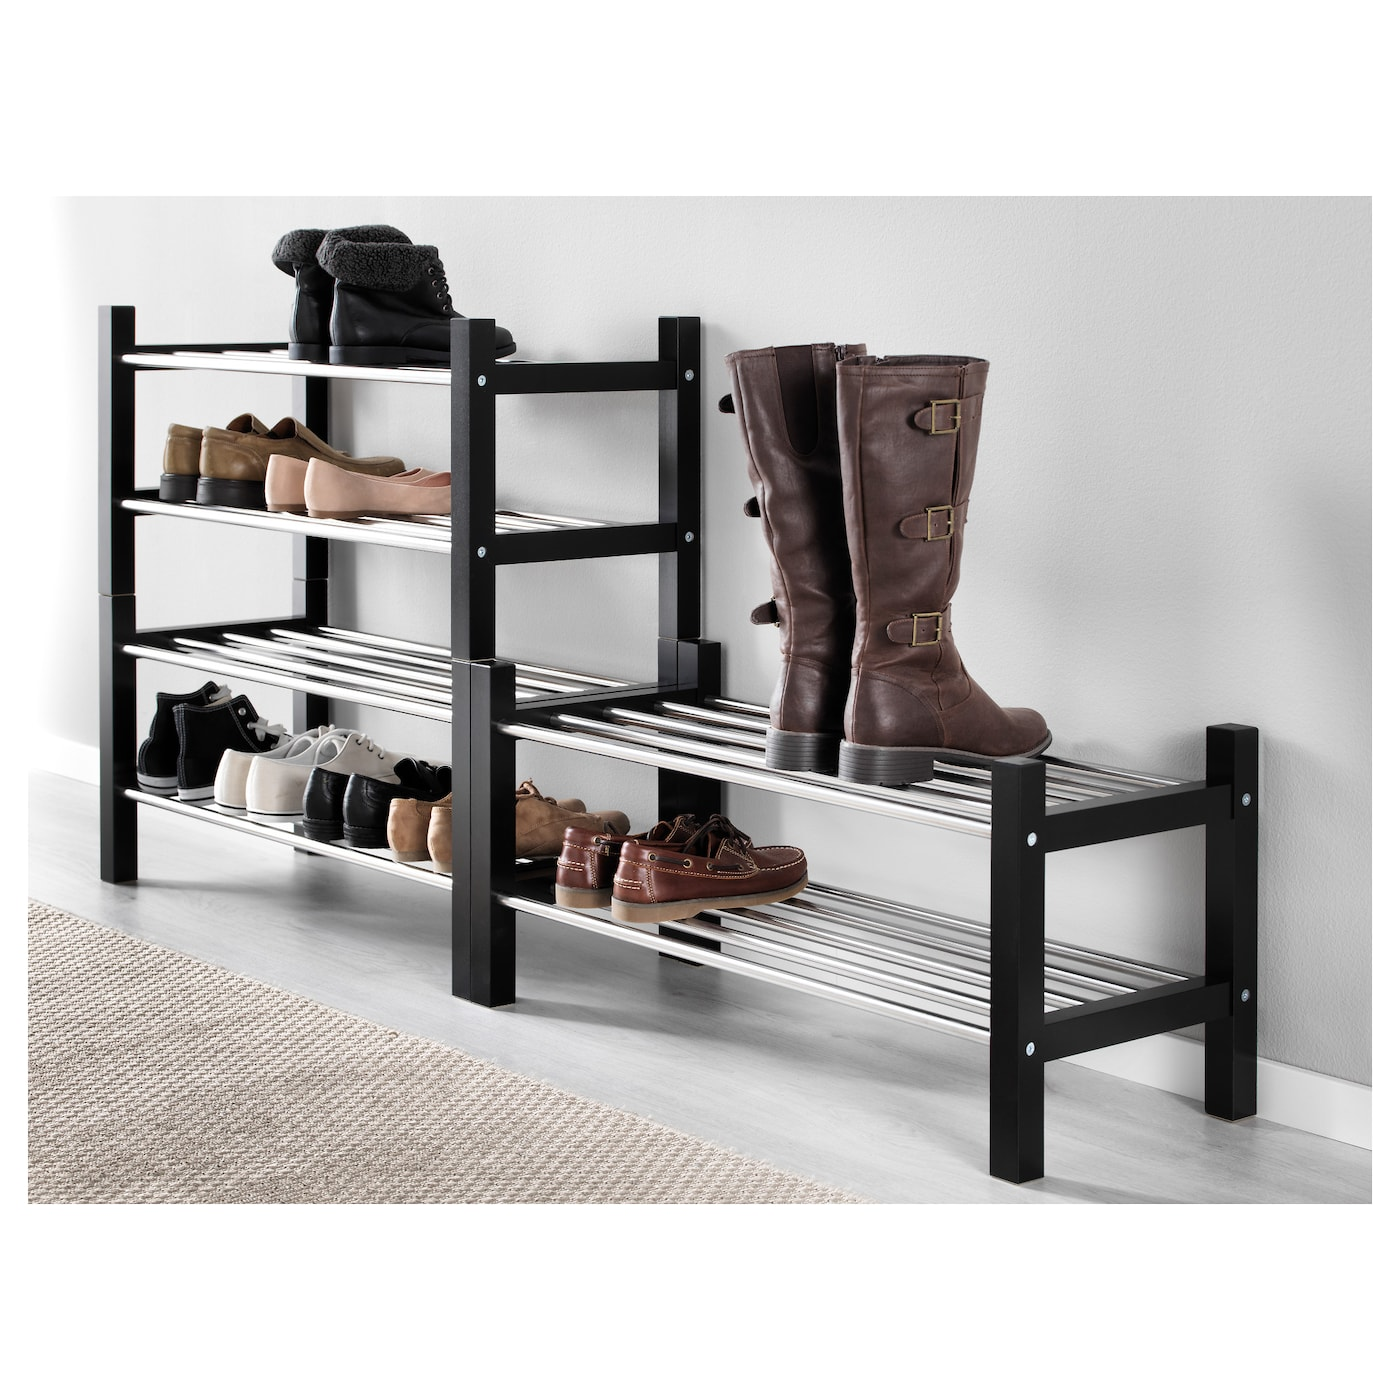 tjusig tag re chaussures noir 79 cm ikea. Black Bedroom Furniture Sets. Home Design Ideas